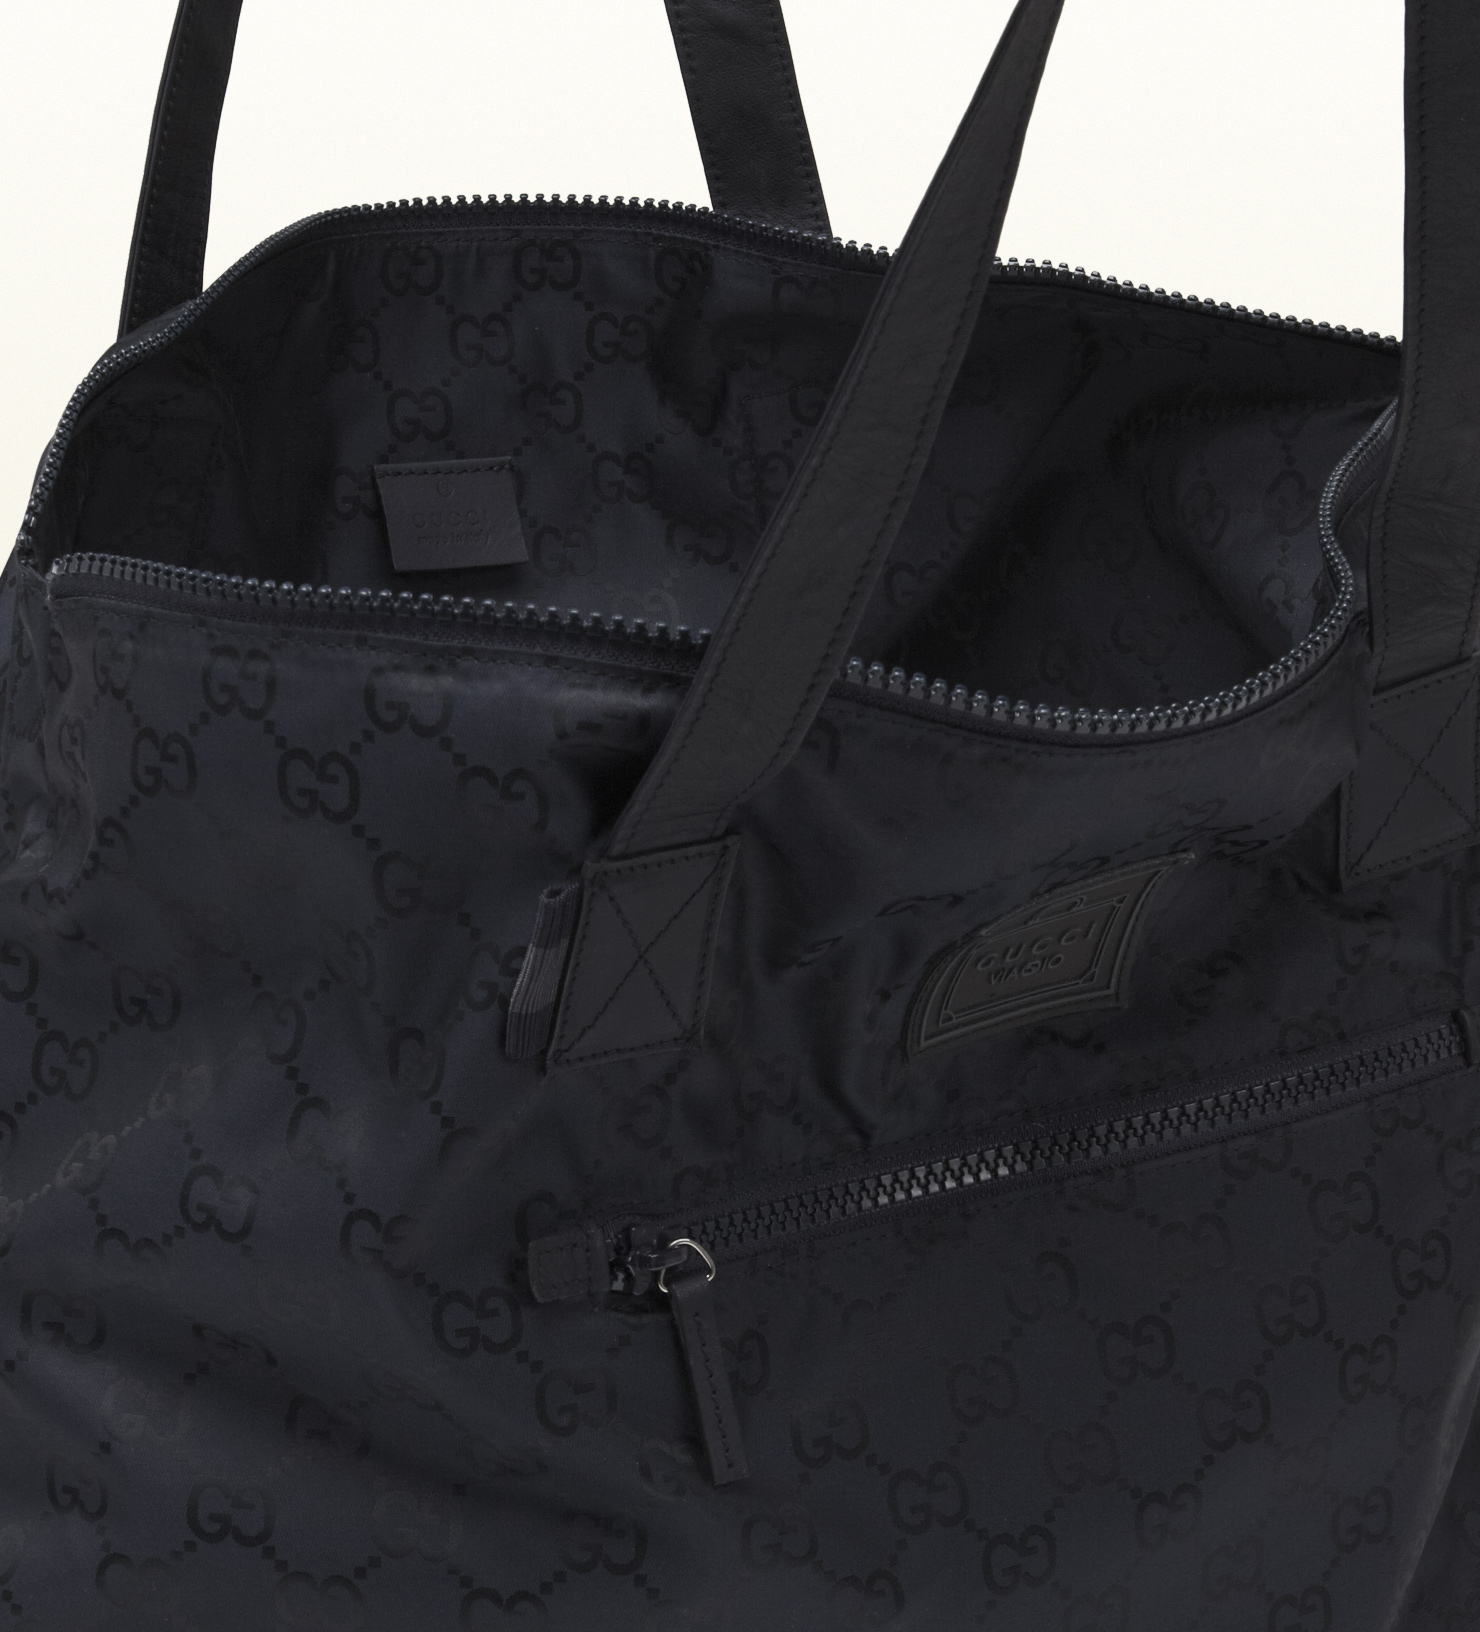 acfa3040ae Men's Blue Gg Nylon Duffel Bag From Viaggio Collection